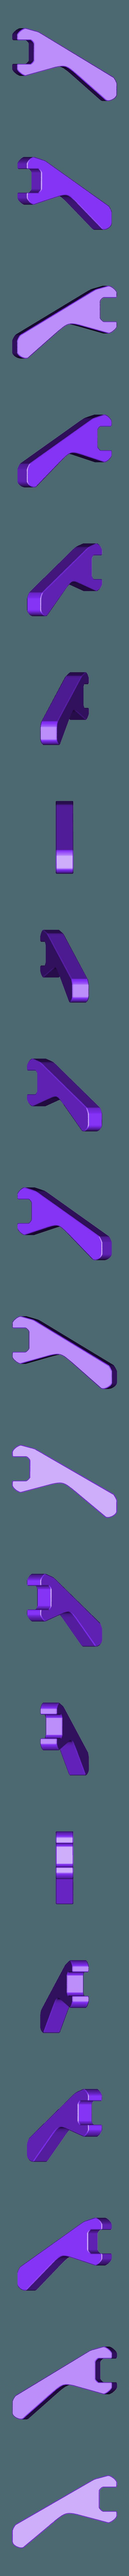 Wrench_16mm.stl Download free STL file Fidget Cube Remix • Object to 3D print, WalterHsiao